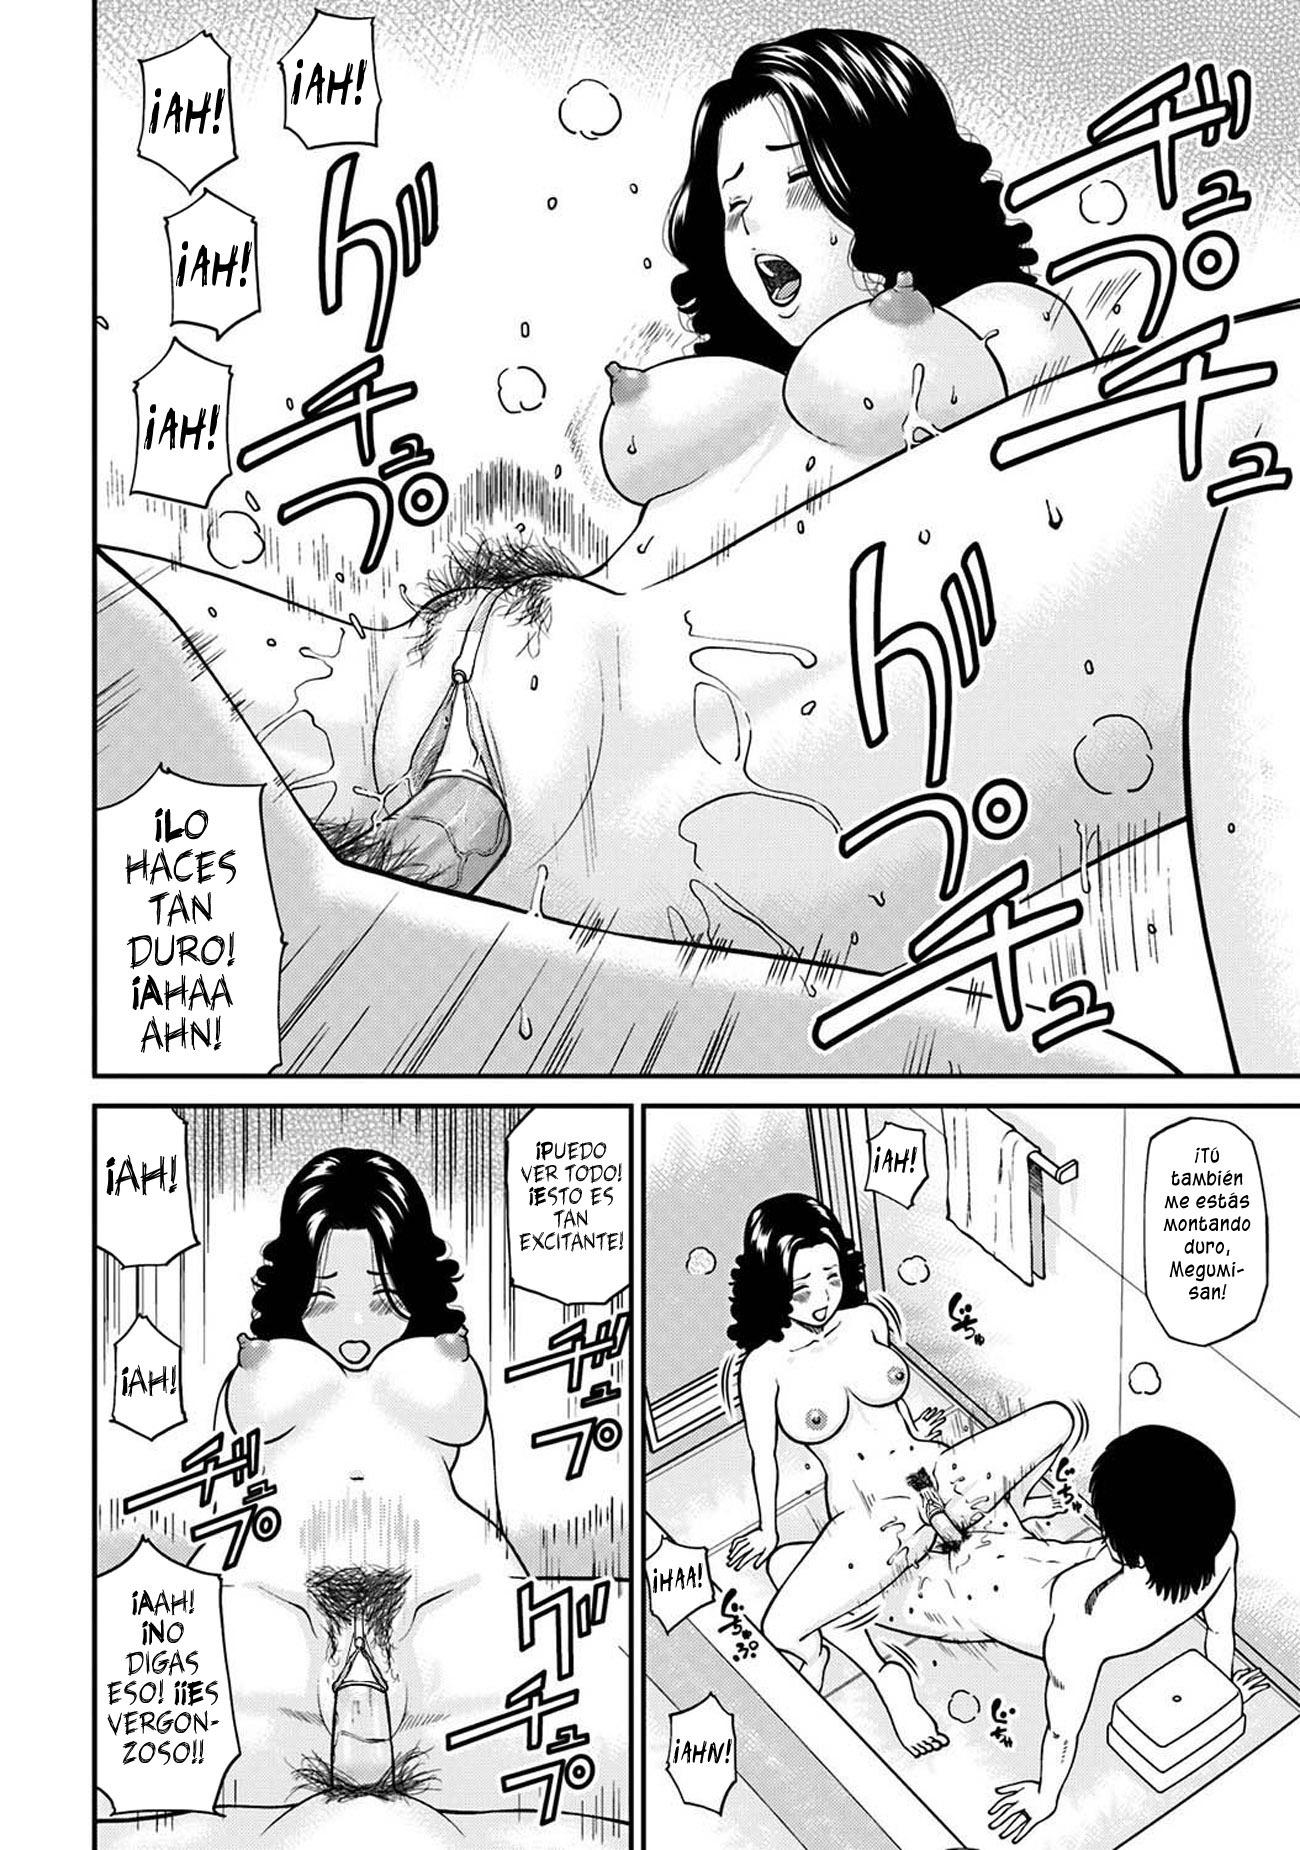 ama porno video hentai